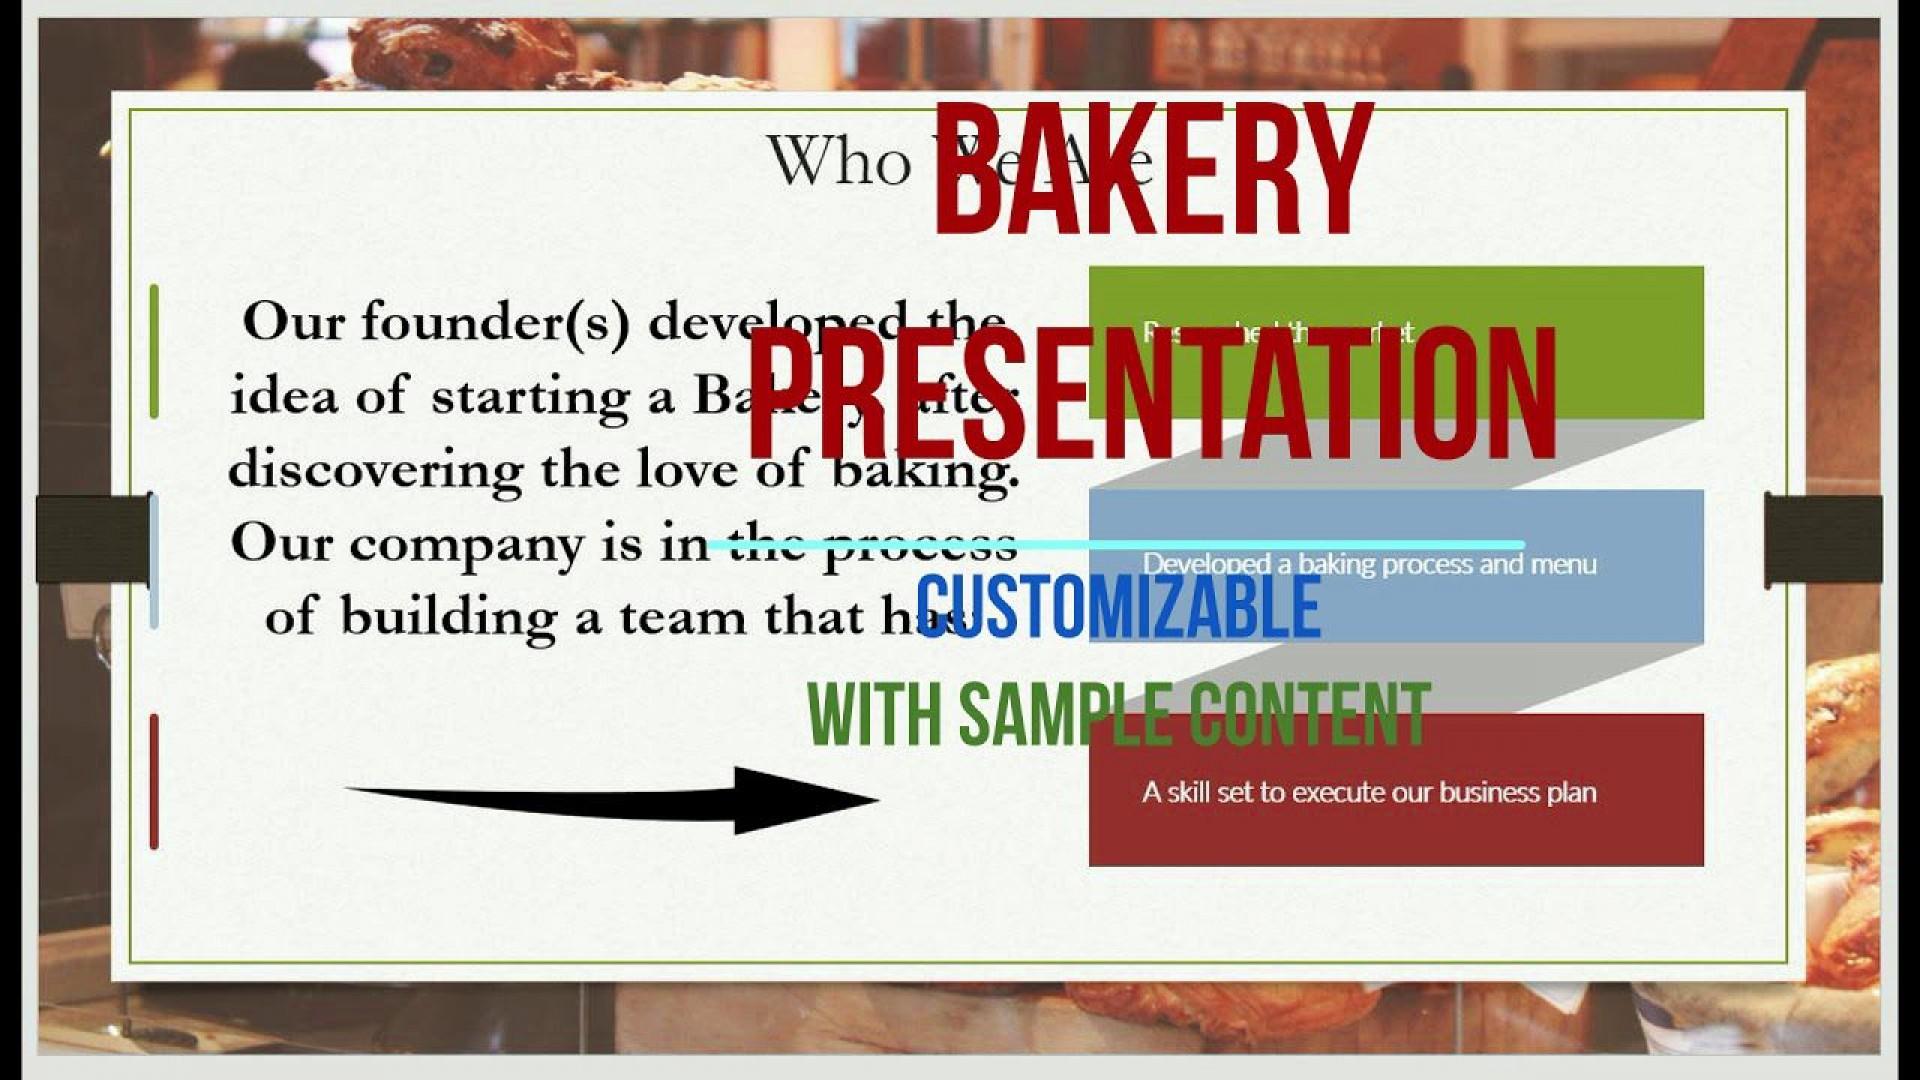 007 Best Small Restaurant Busines Plan Ppt Presentation Image  Powerpoint1920